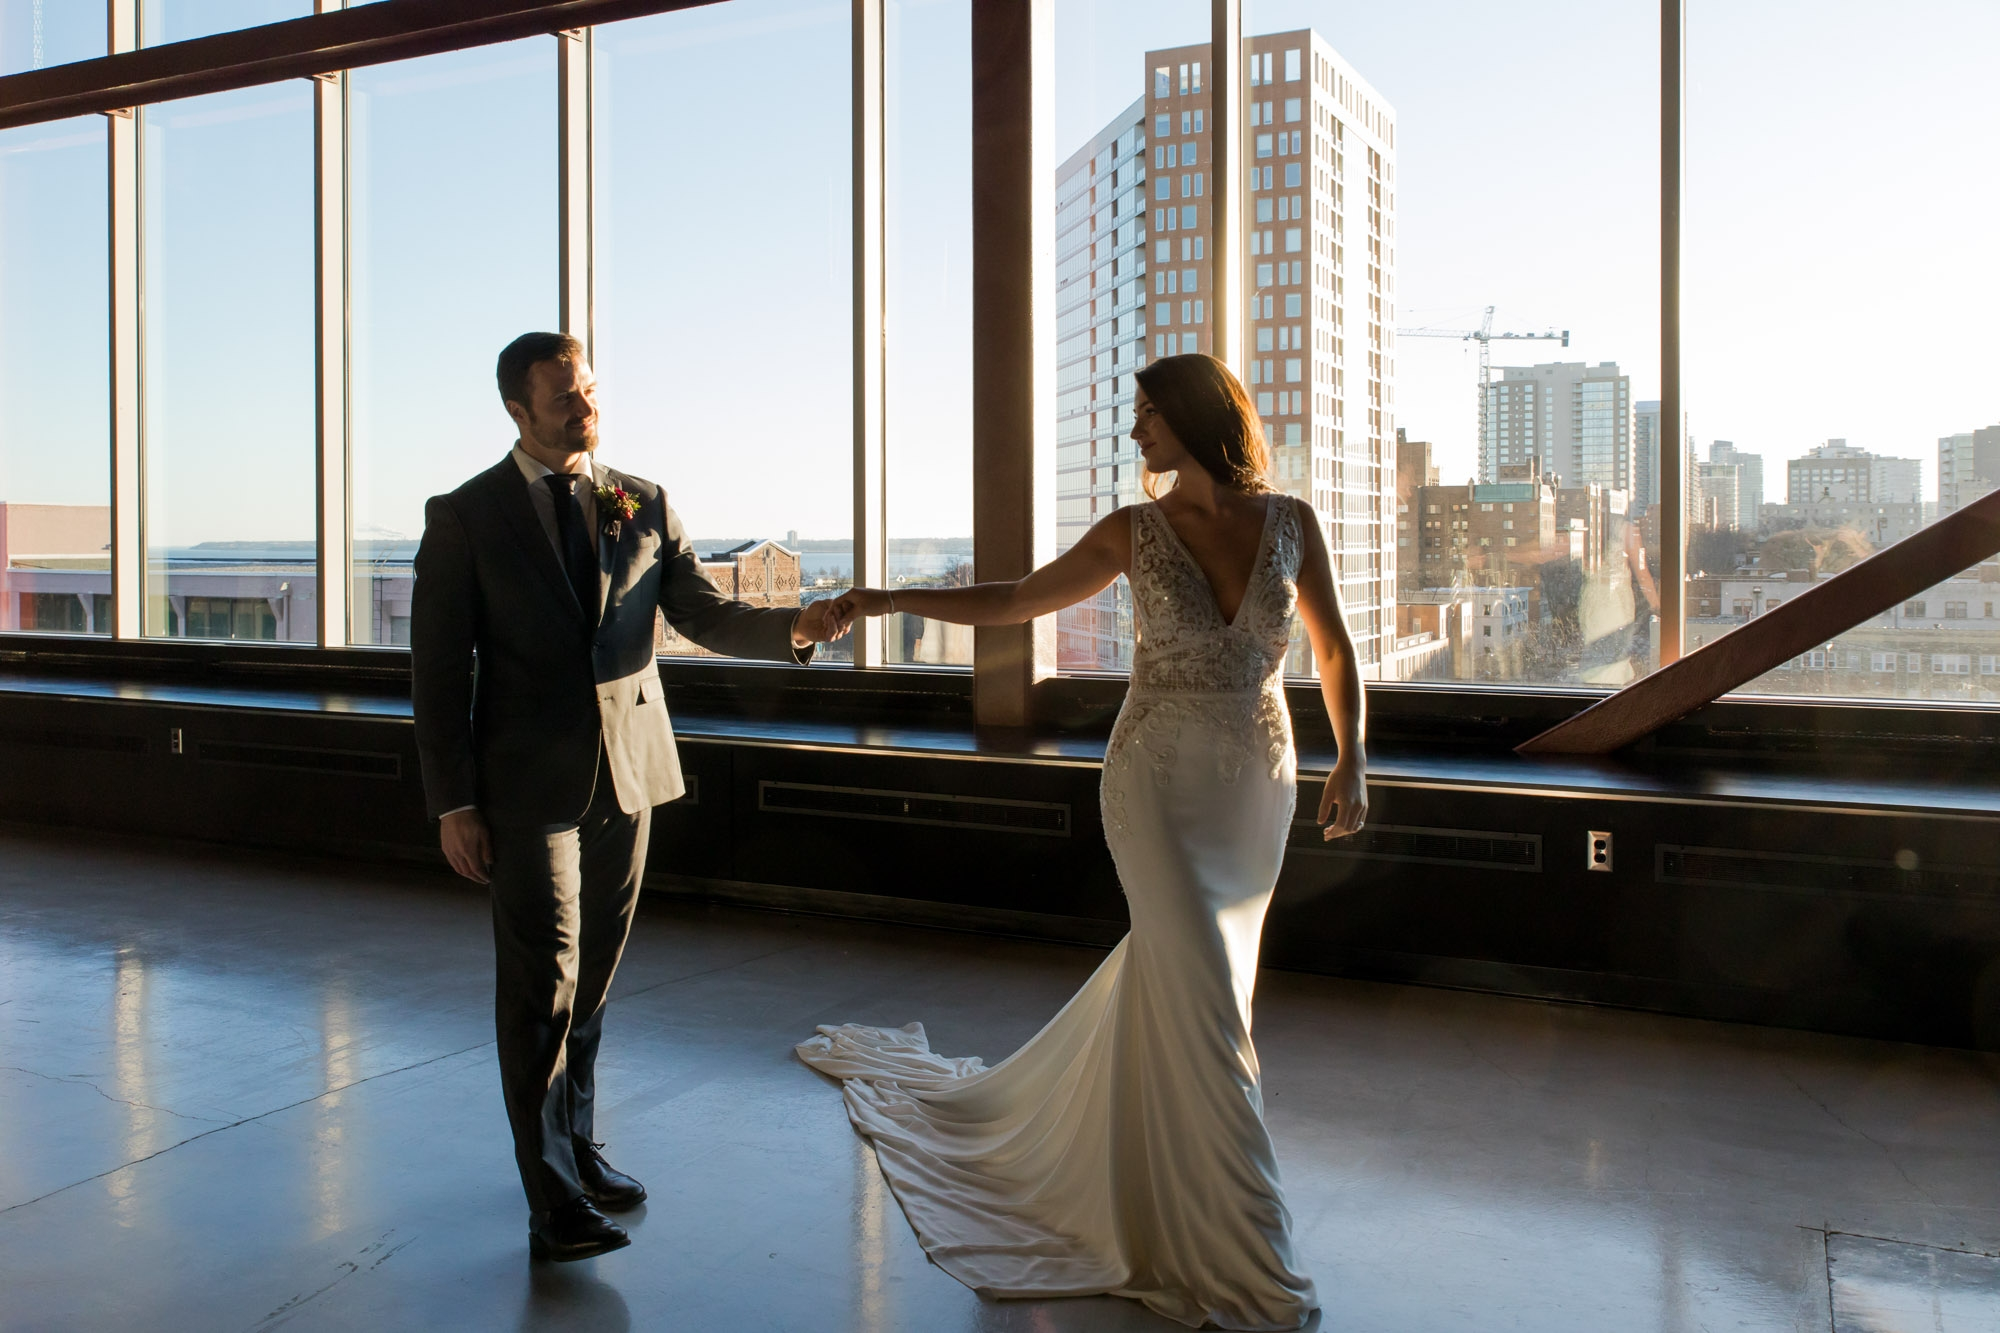 Jan Serr Styled Shoot, Jan Serr studio wedding, jan serr studio , jan serr studio photographer, austin wedding photographer, milwaukee wedding photographer, studio k10